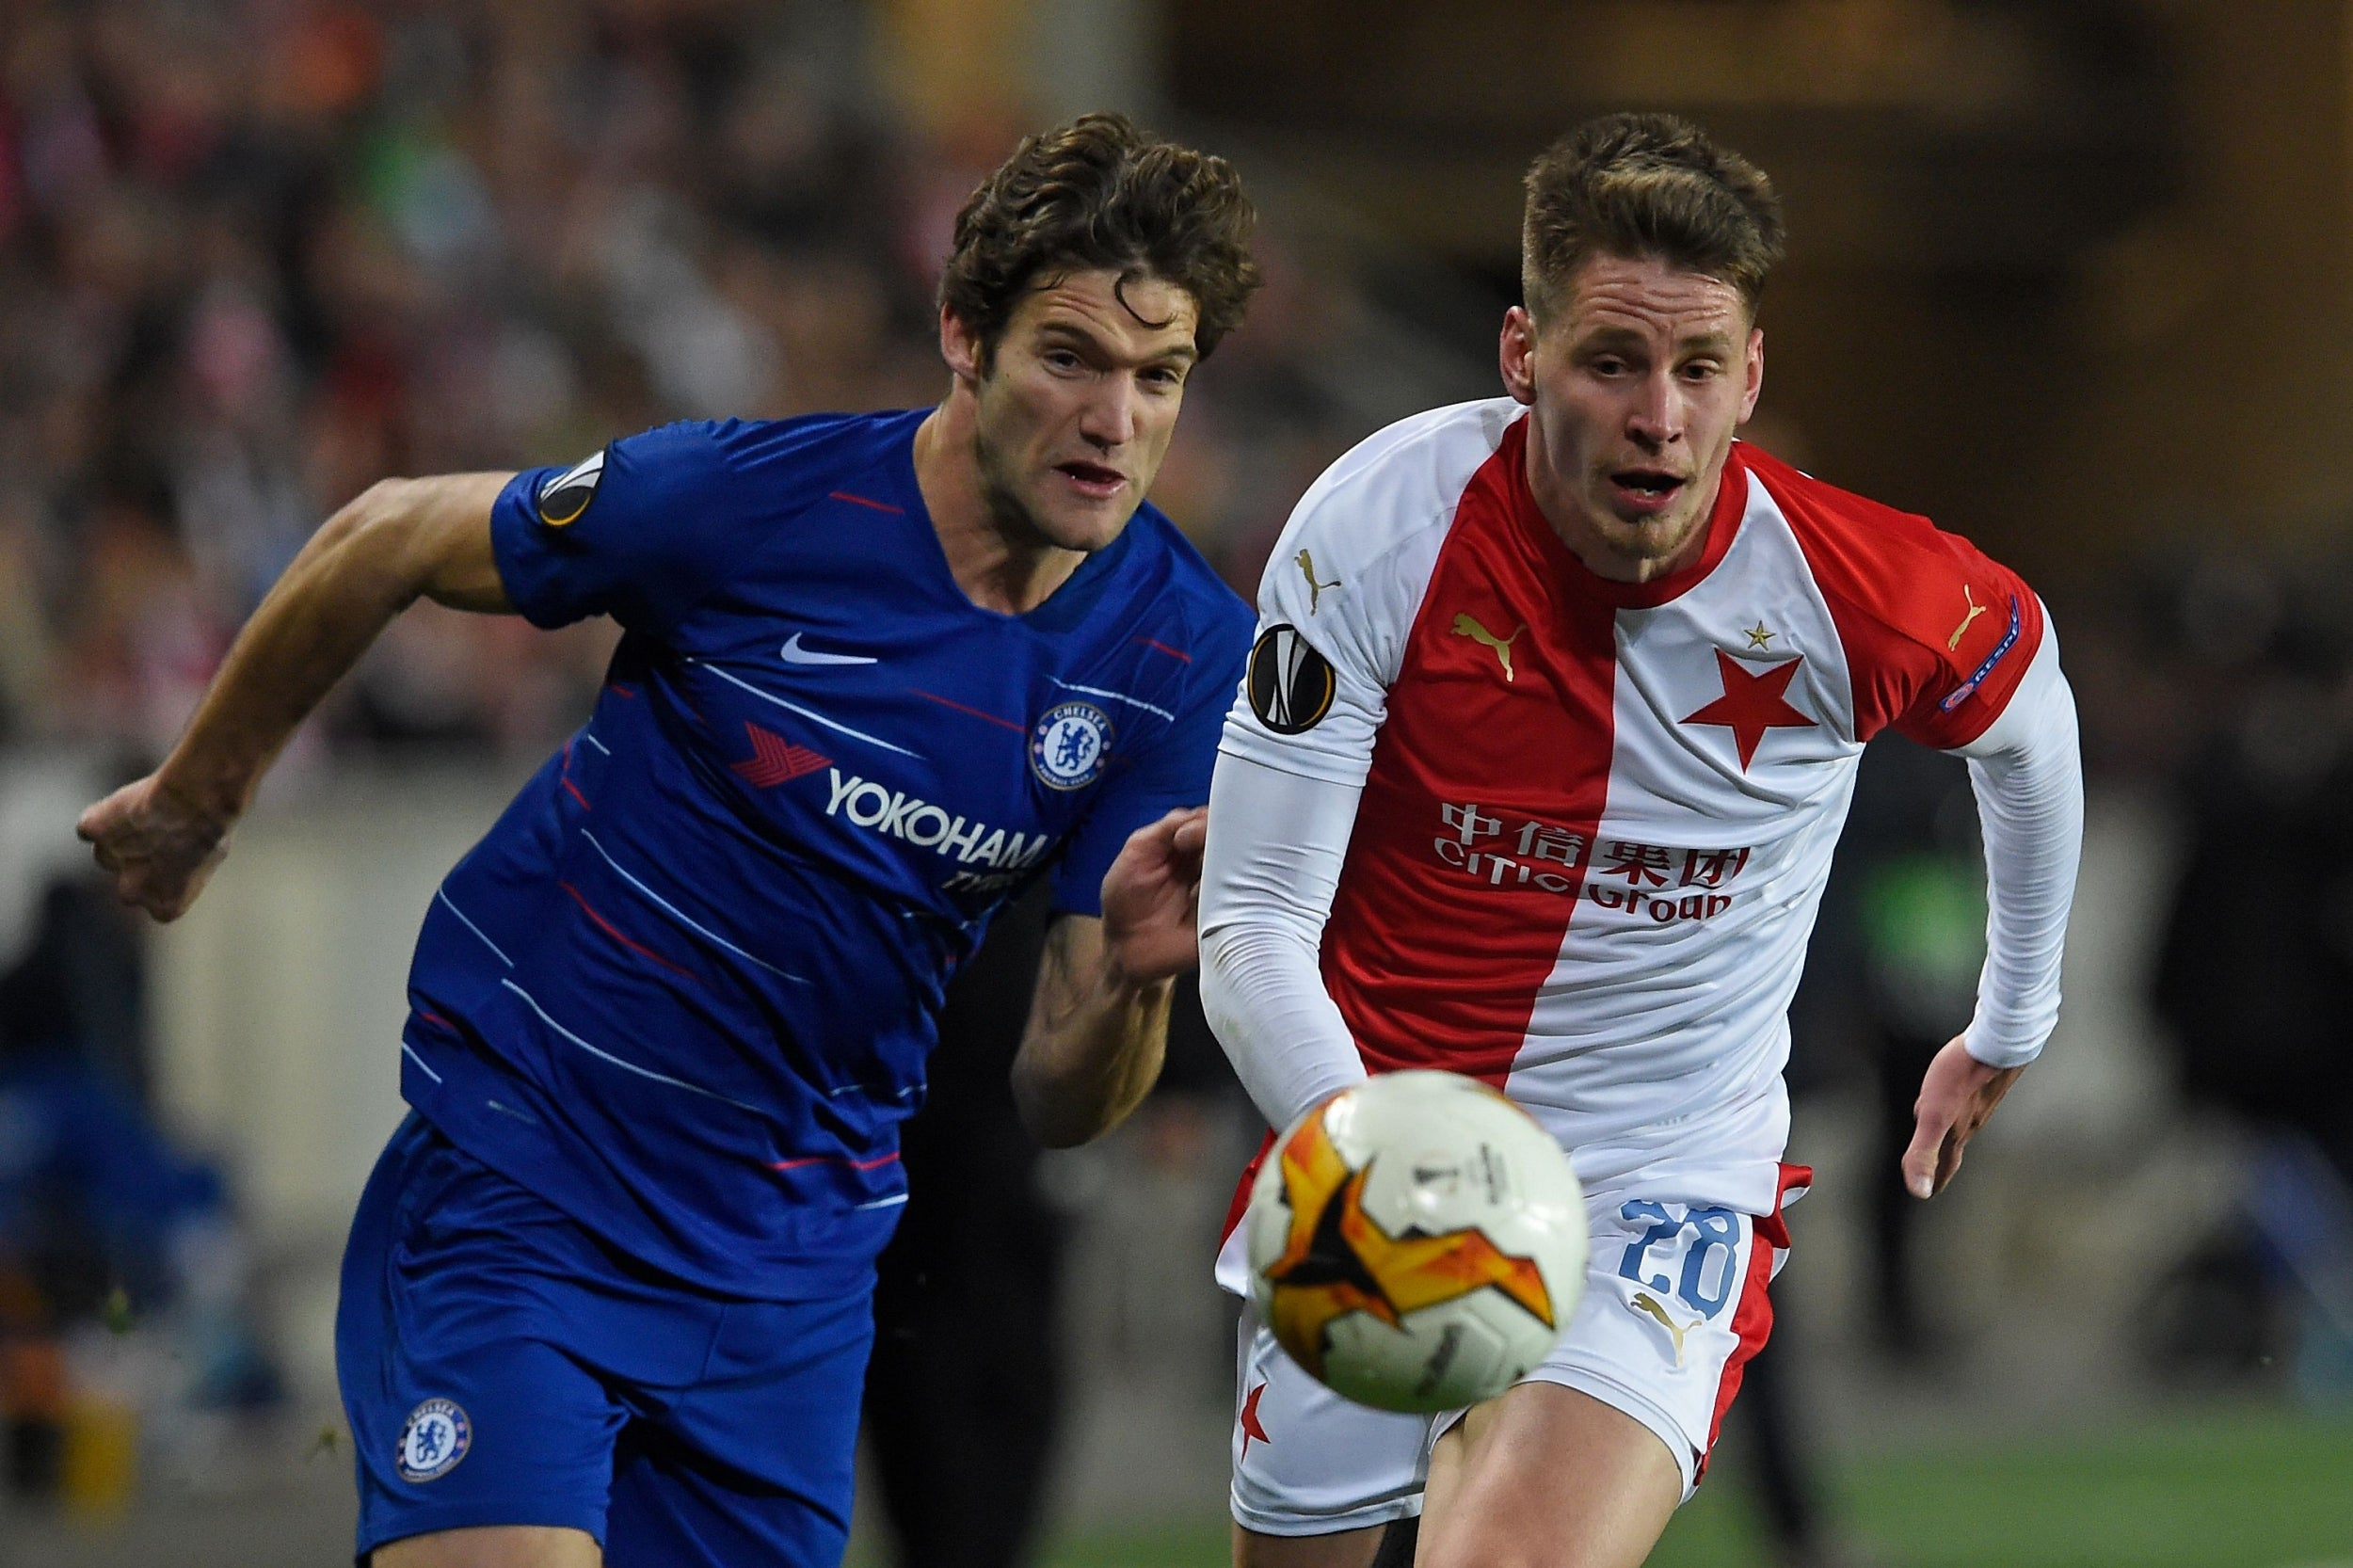 Chelsea vs Slavia Prague prediction: How will Europa League quarter-final second leg play out?